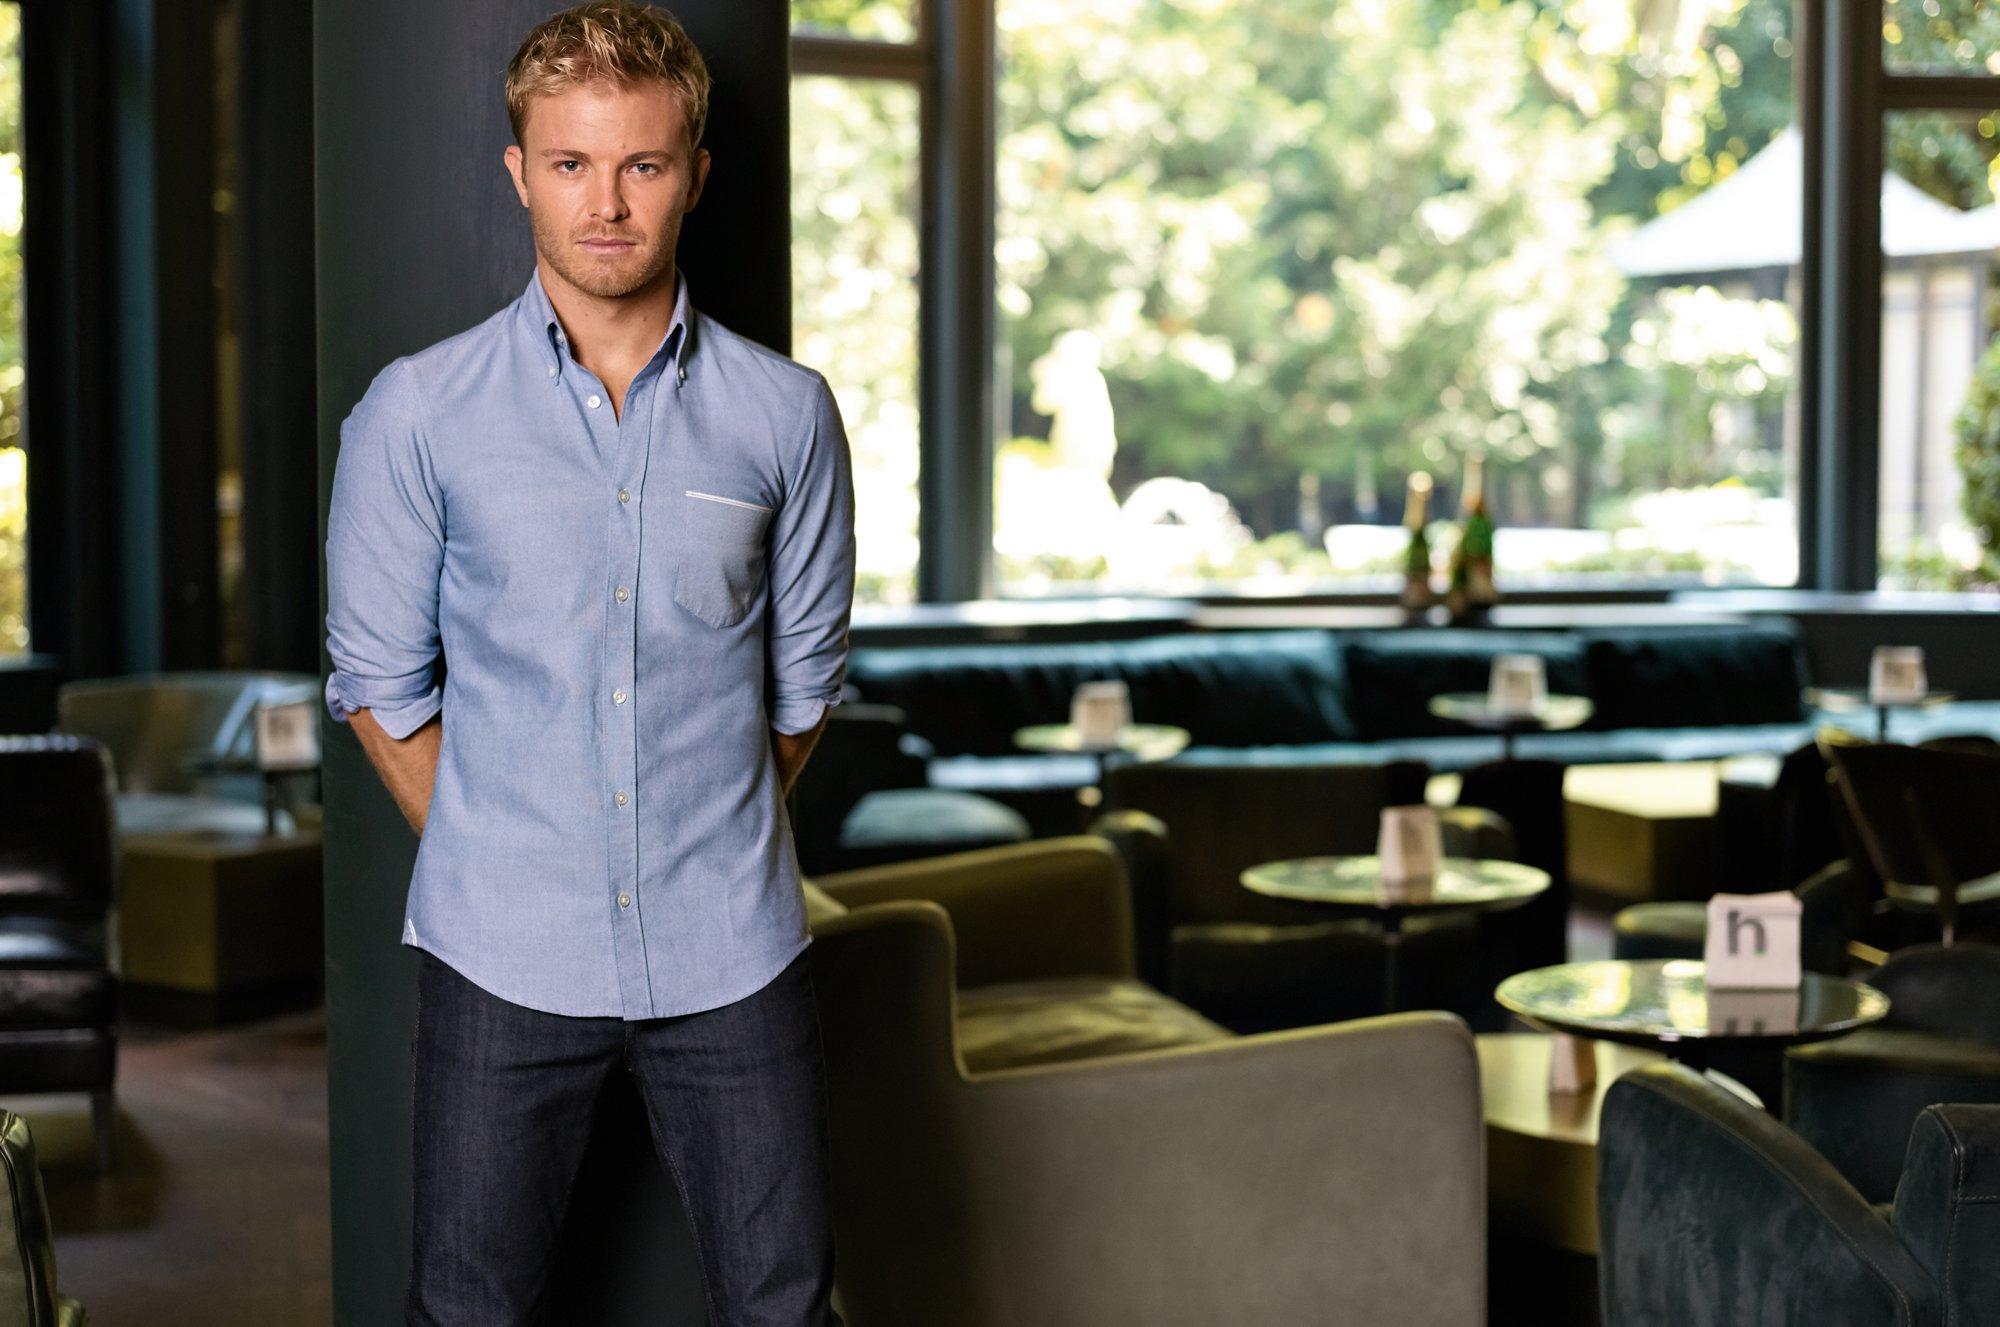 Nico Rosberg wearing BOSS Wardrobe Staples